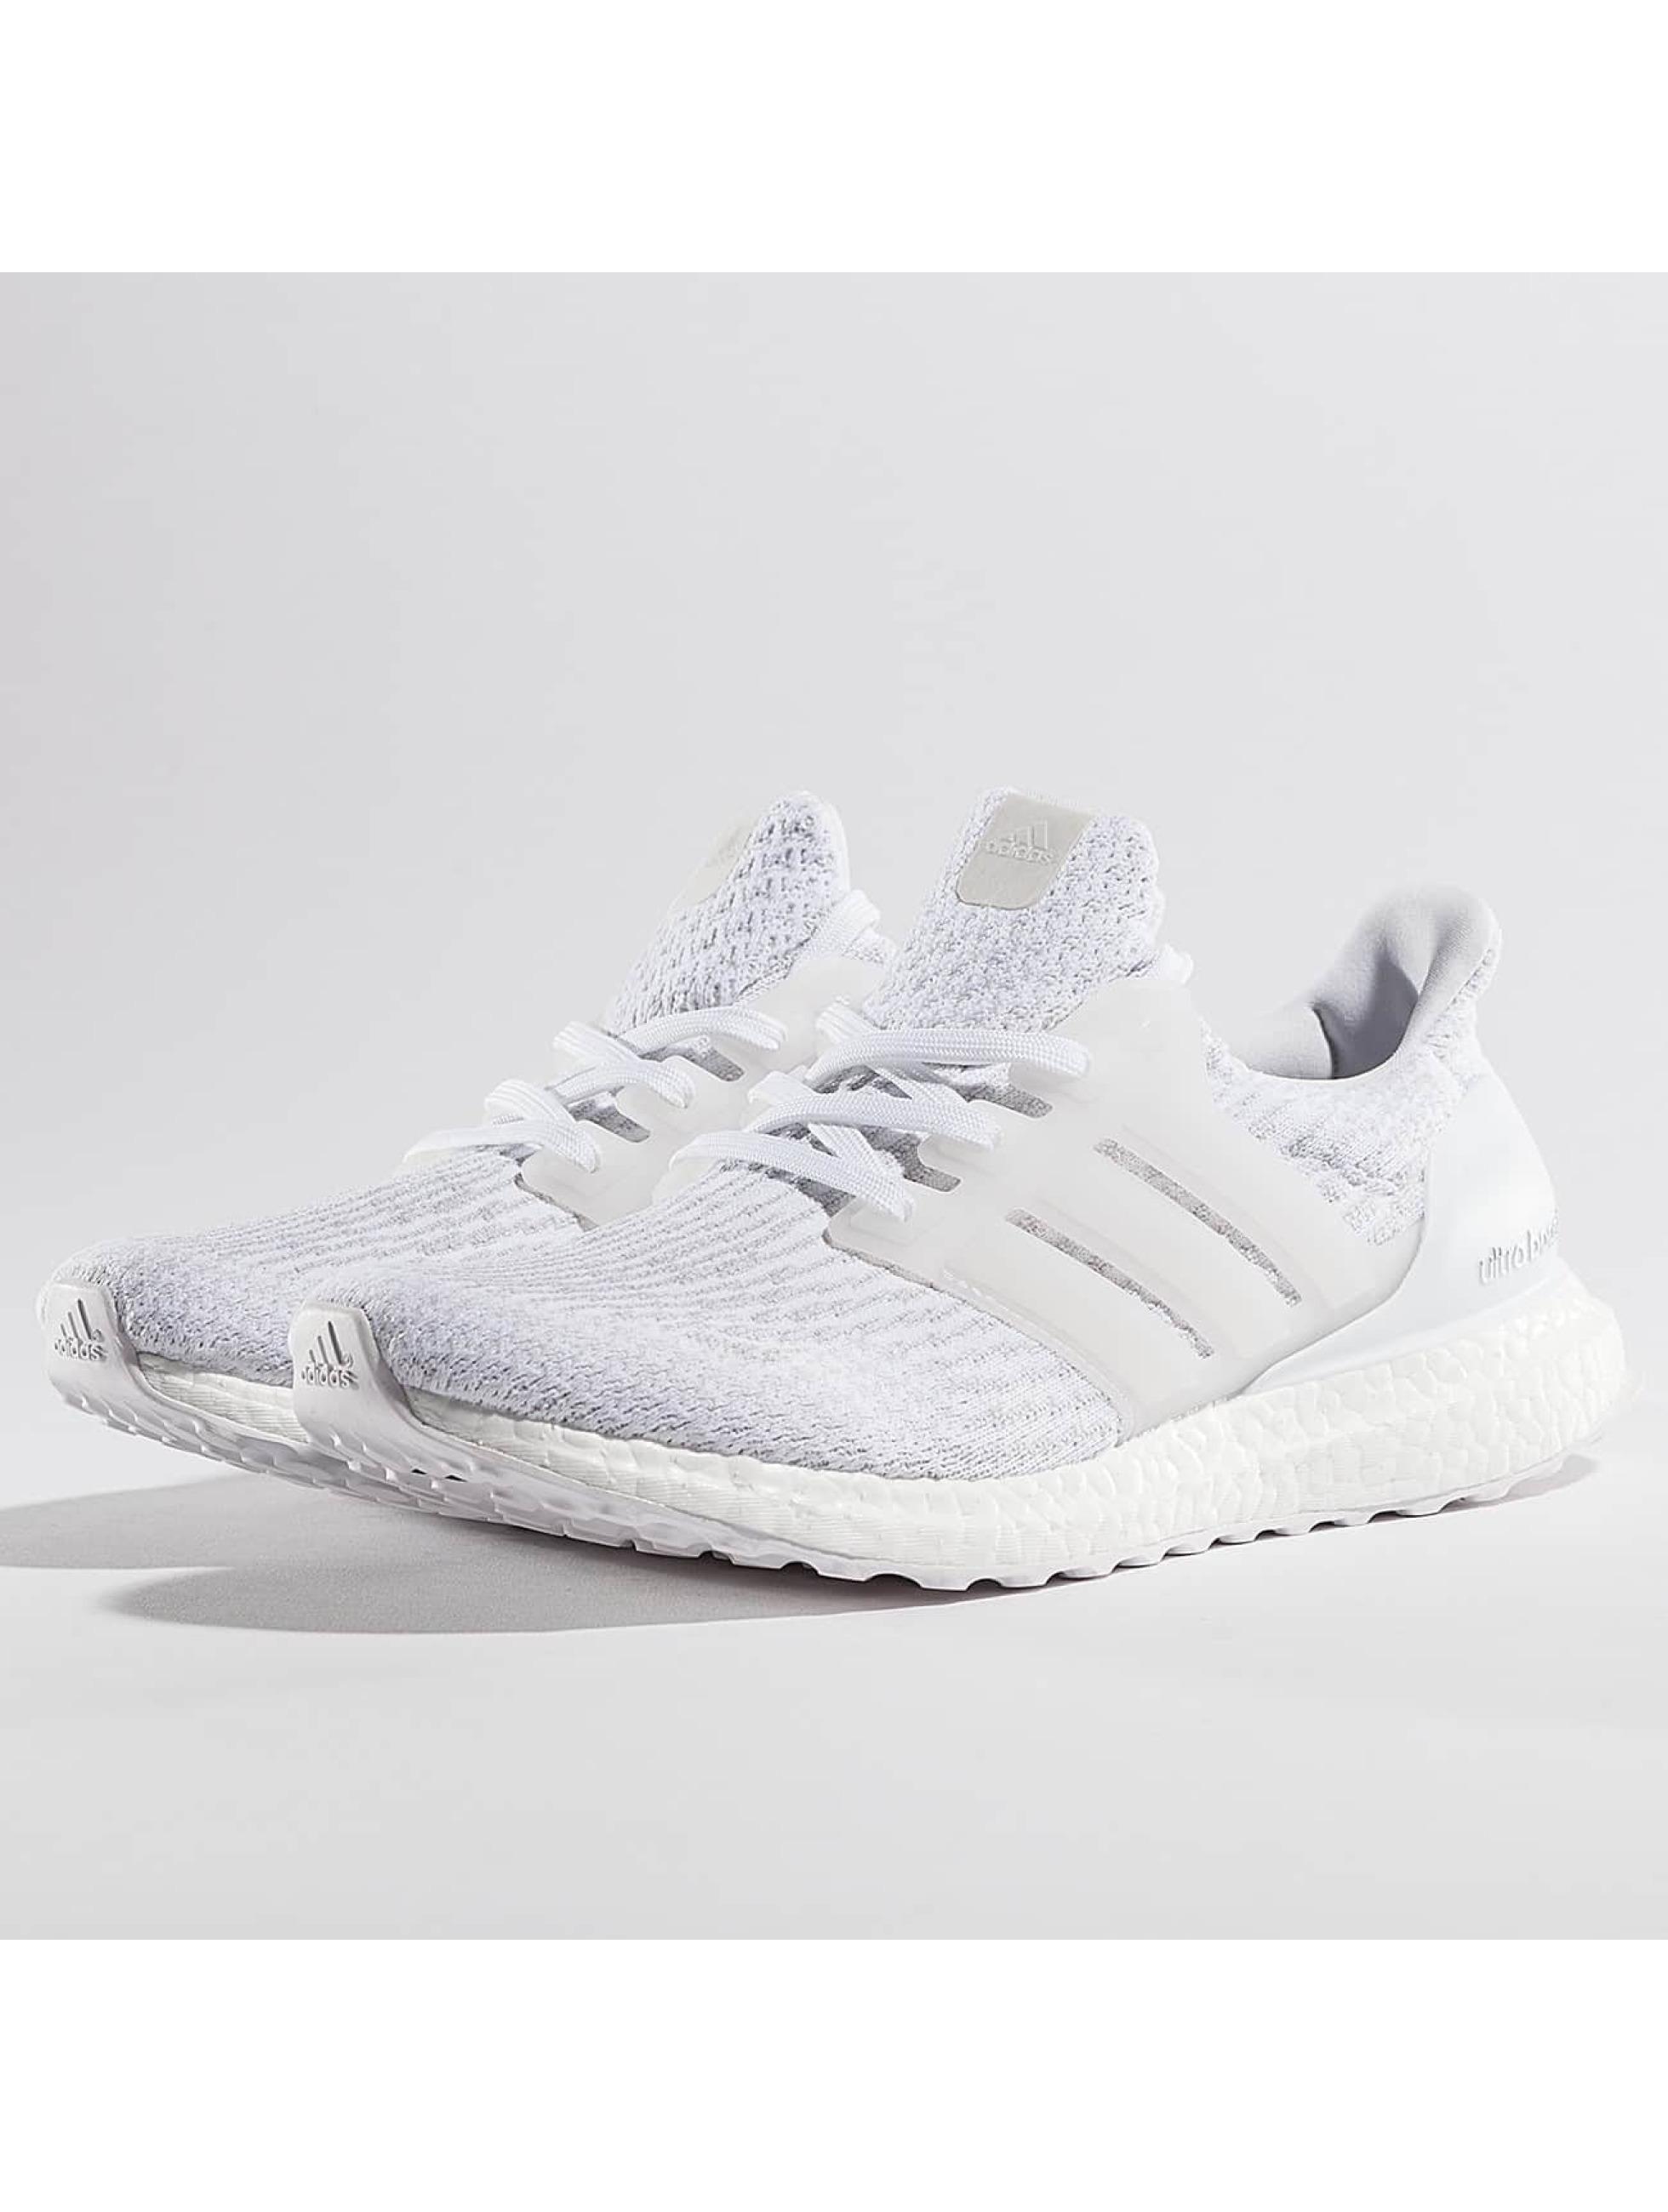 adidas Performance Männer,Frauen Sneaker Ultra Boost in weiß